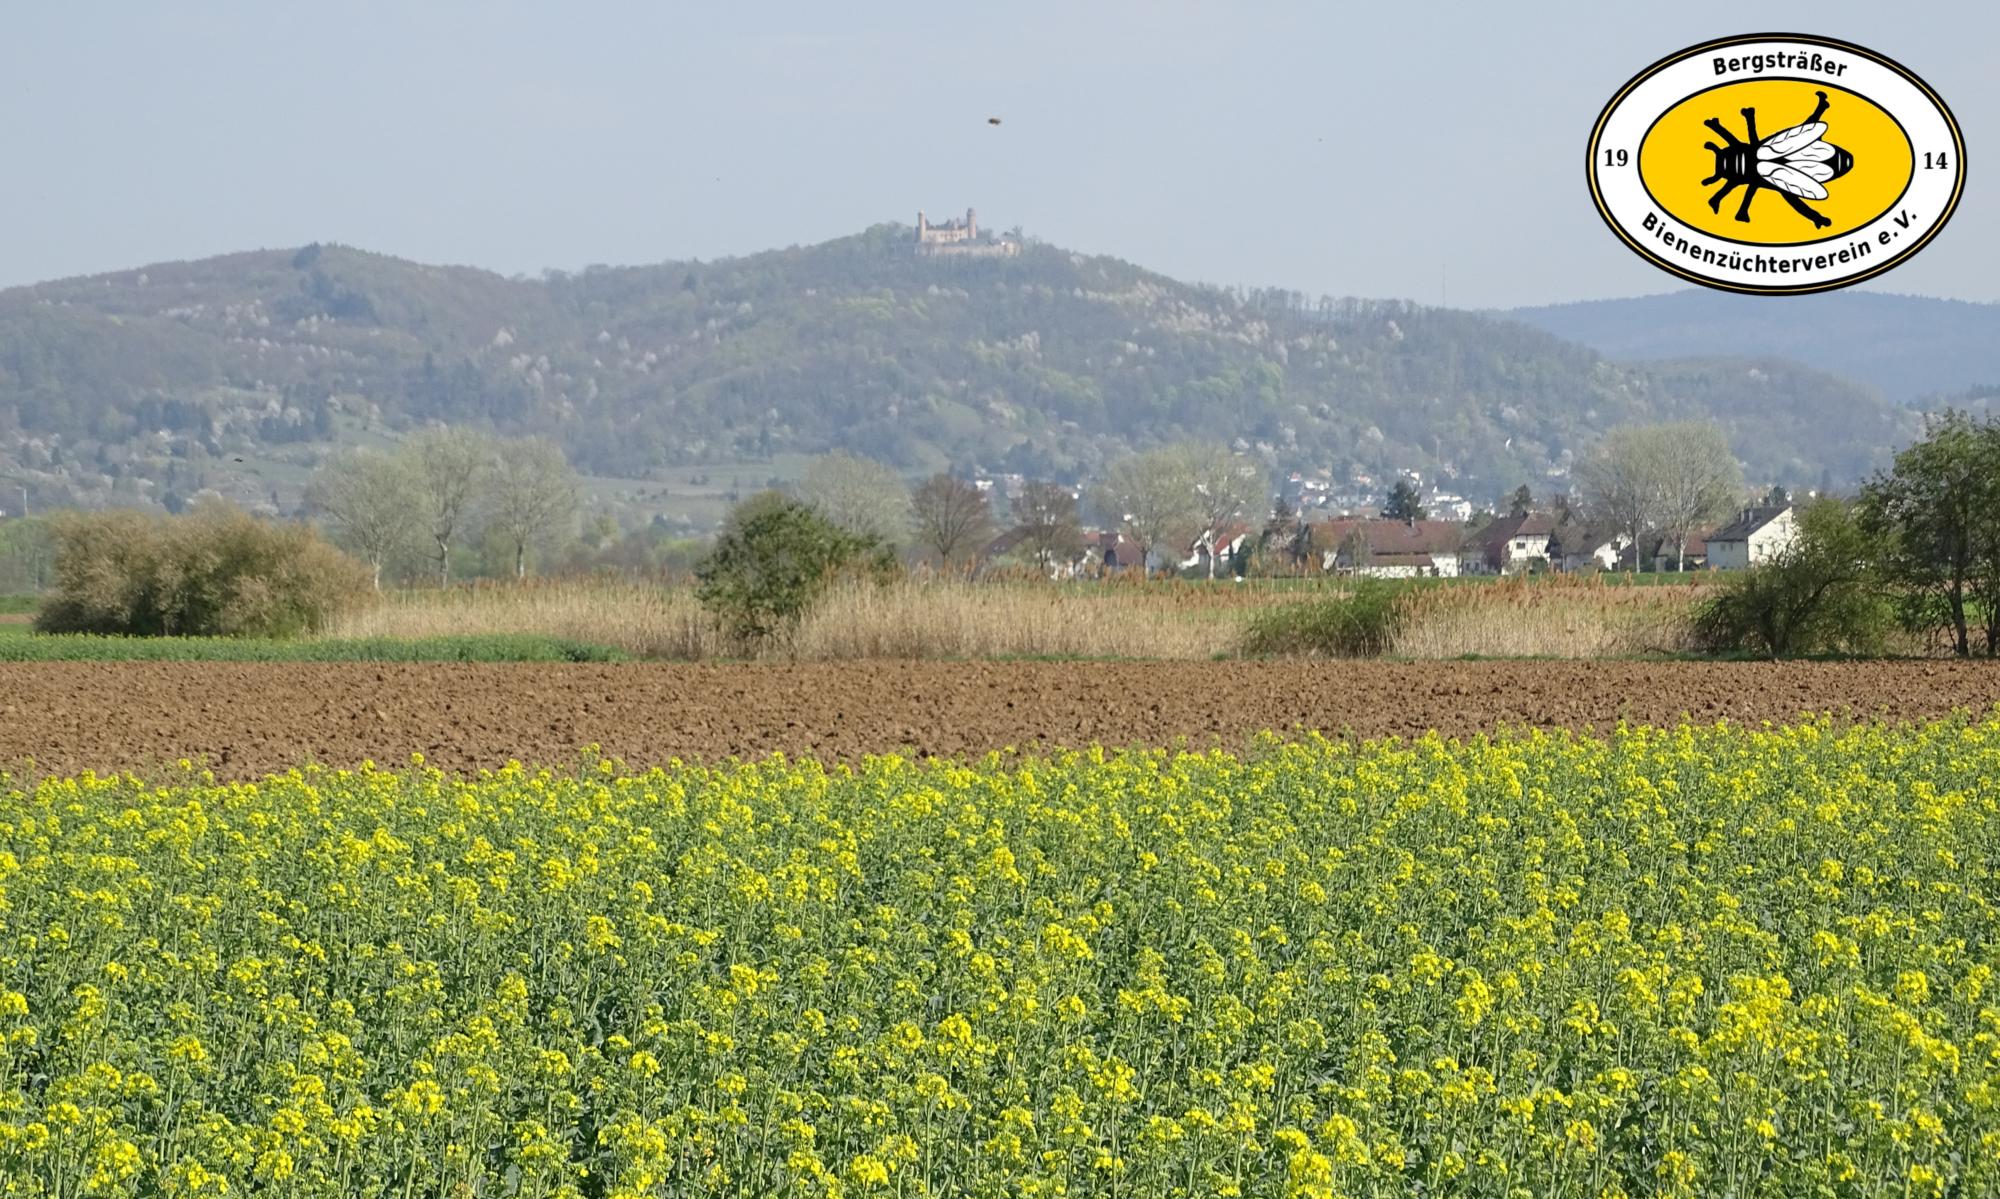 Bergsträßer Bienenzüchterverein e.V.